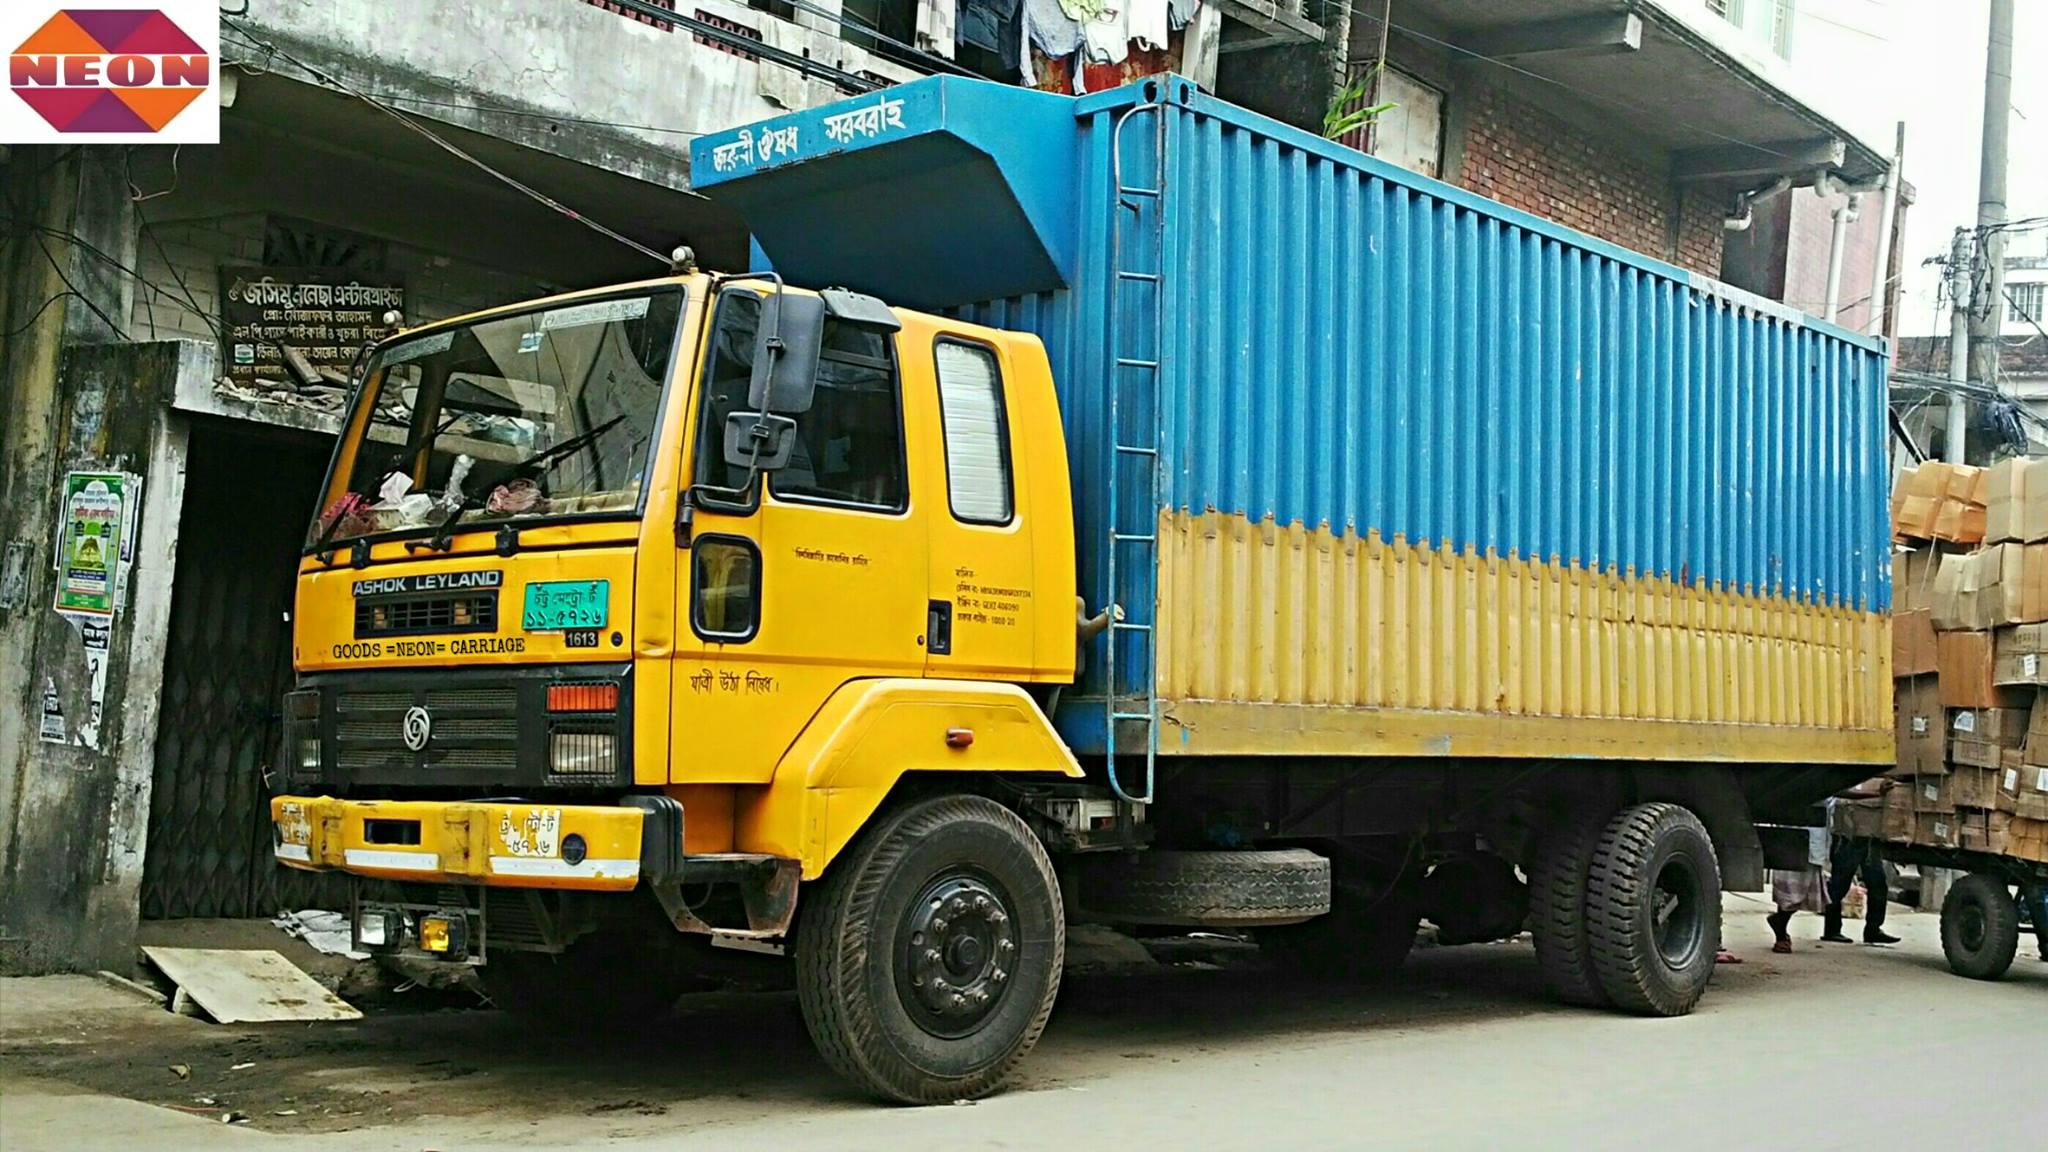 Ashok-Leyland-1613il--MAJHIRGHAT-ROAD--EAST-MADARBARI--CHITTAGONG--BANGLADESH-